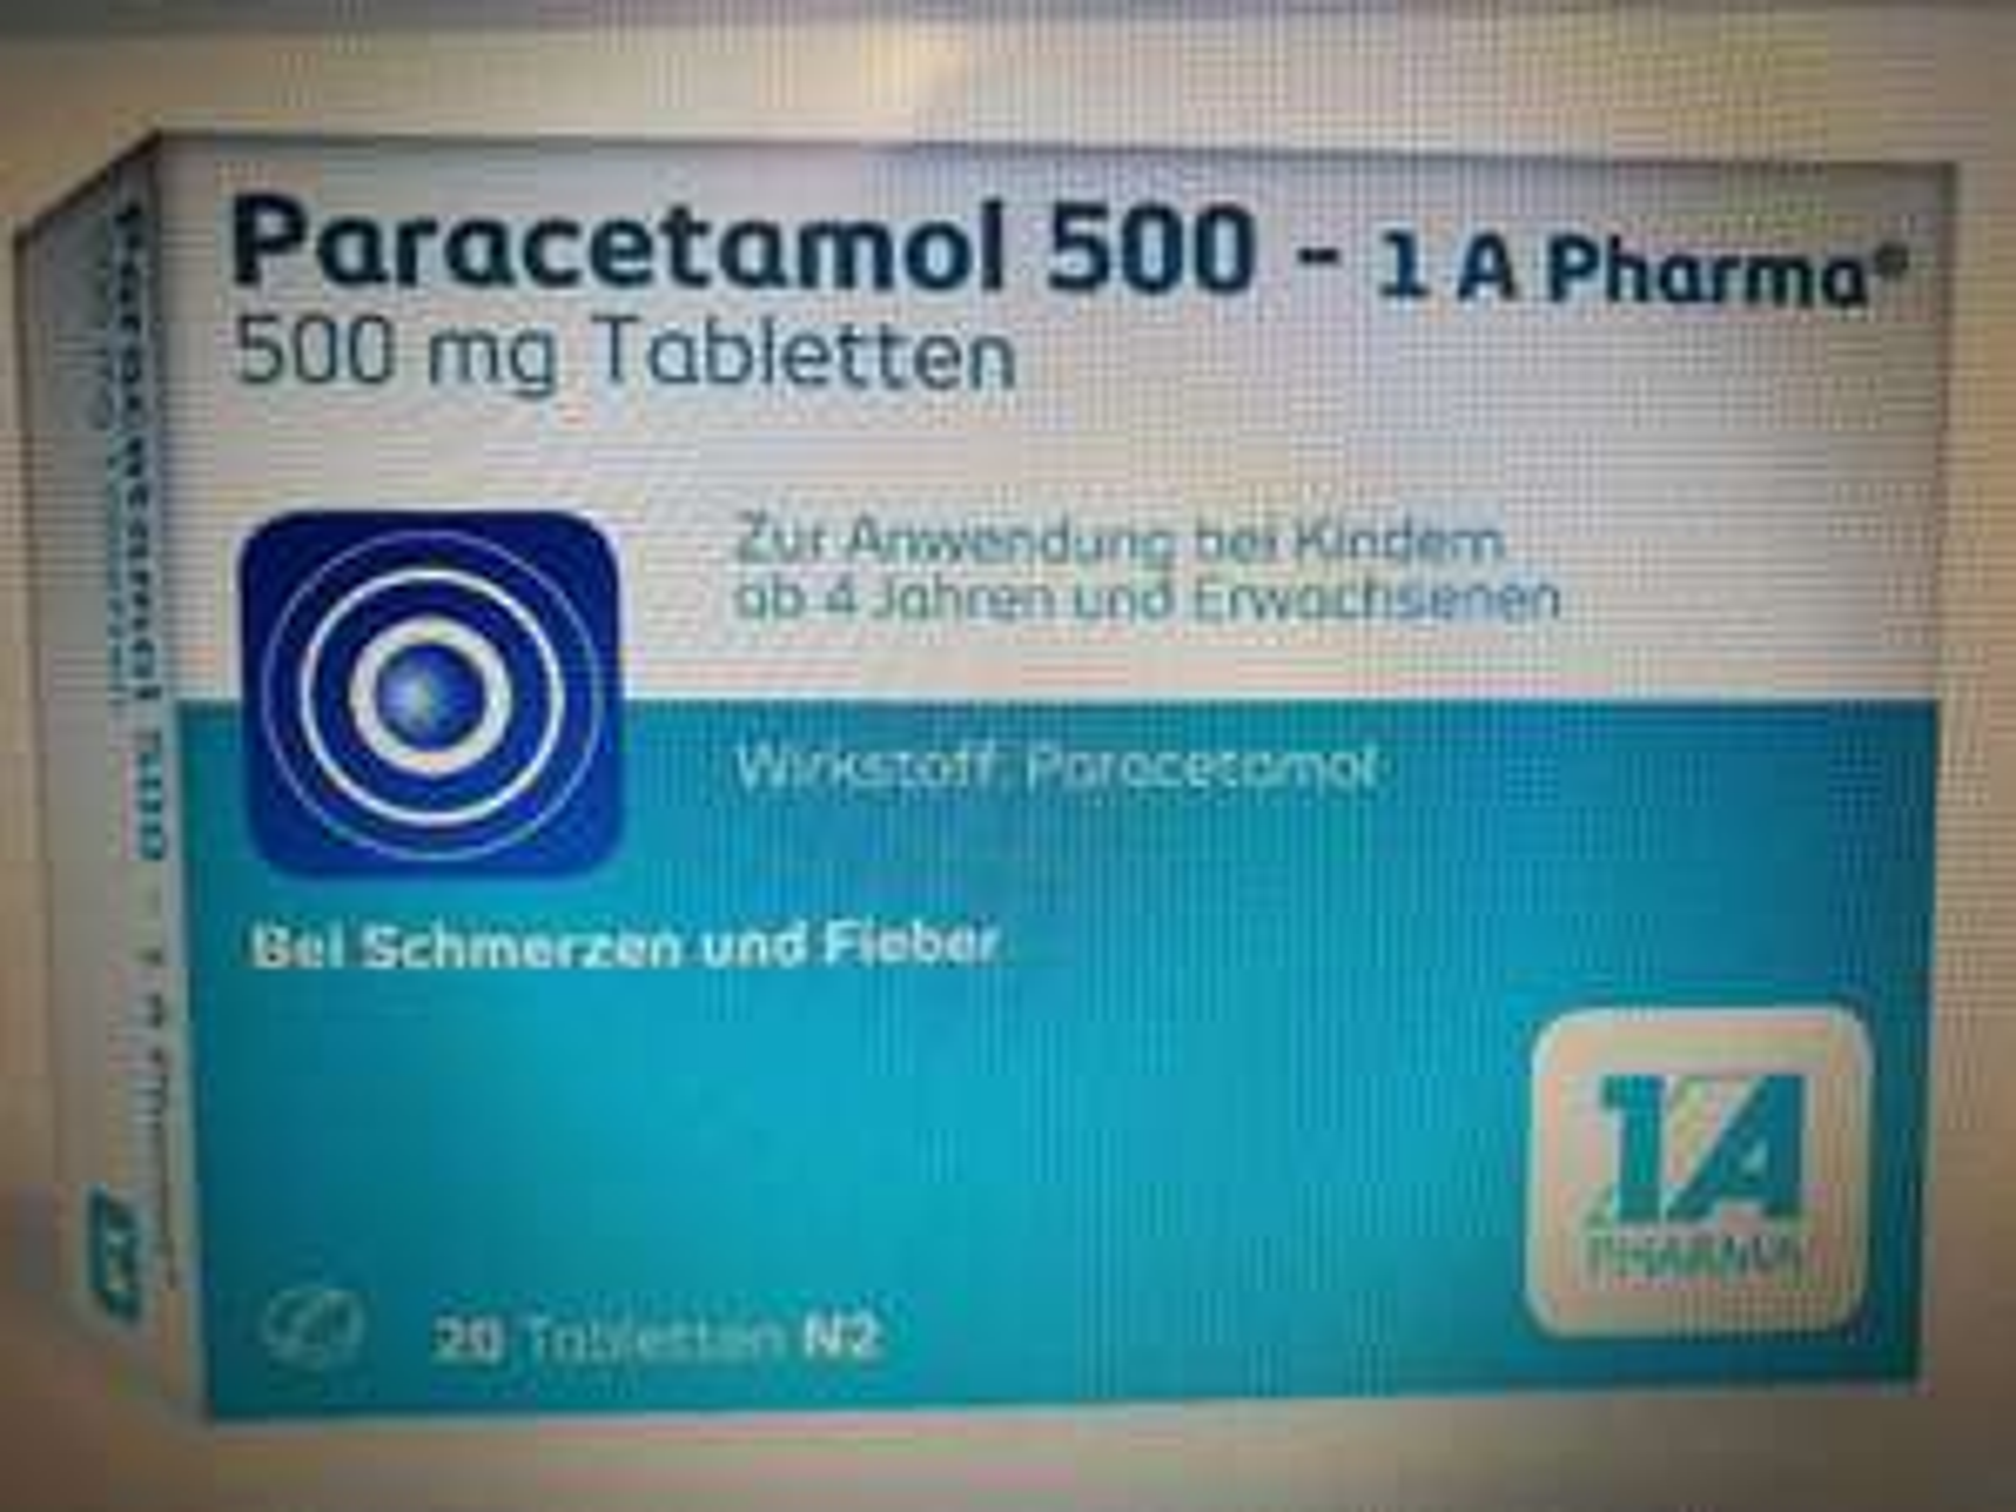 [Paracetamol] 20 Tabletten Paracetamol 500 mg zum aktuellen Tiefstpreis